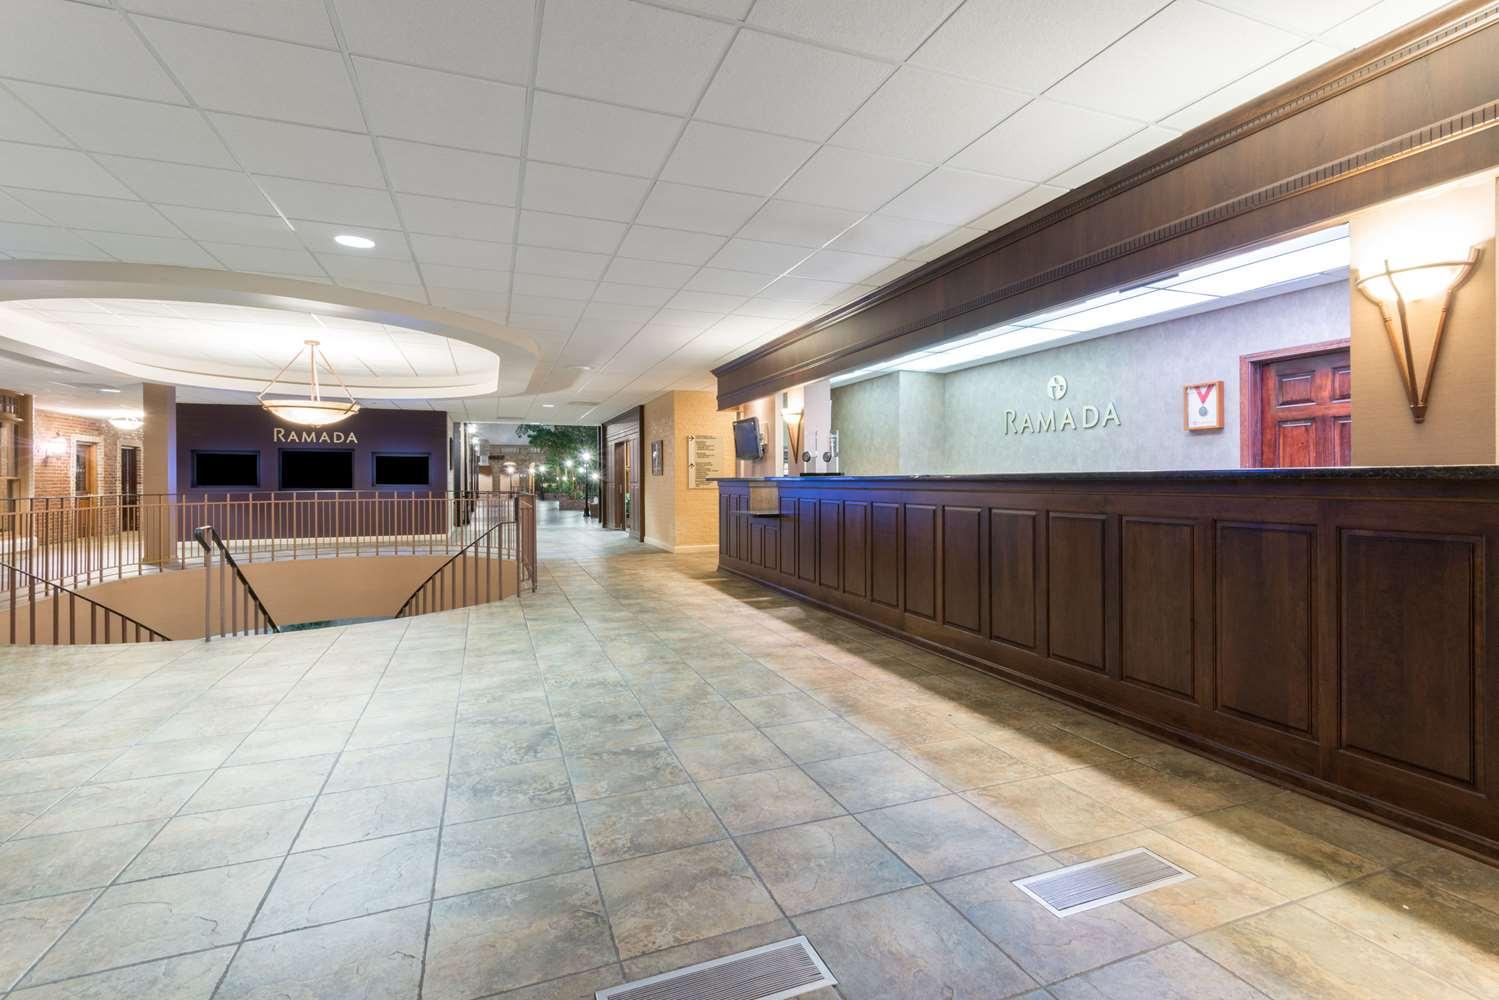 Lobby - Ramada Inn Convention Center Downtown Topeka